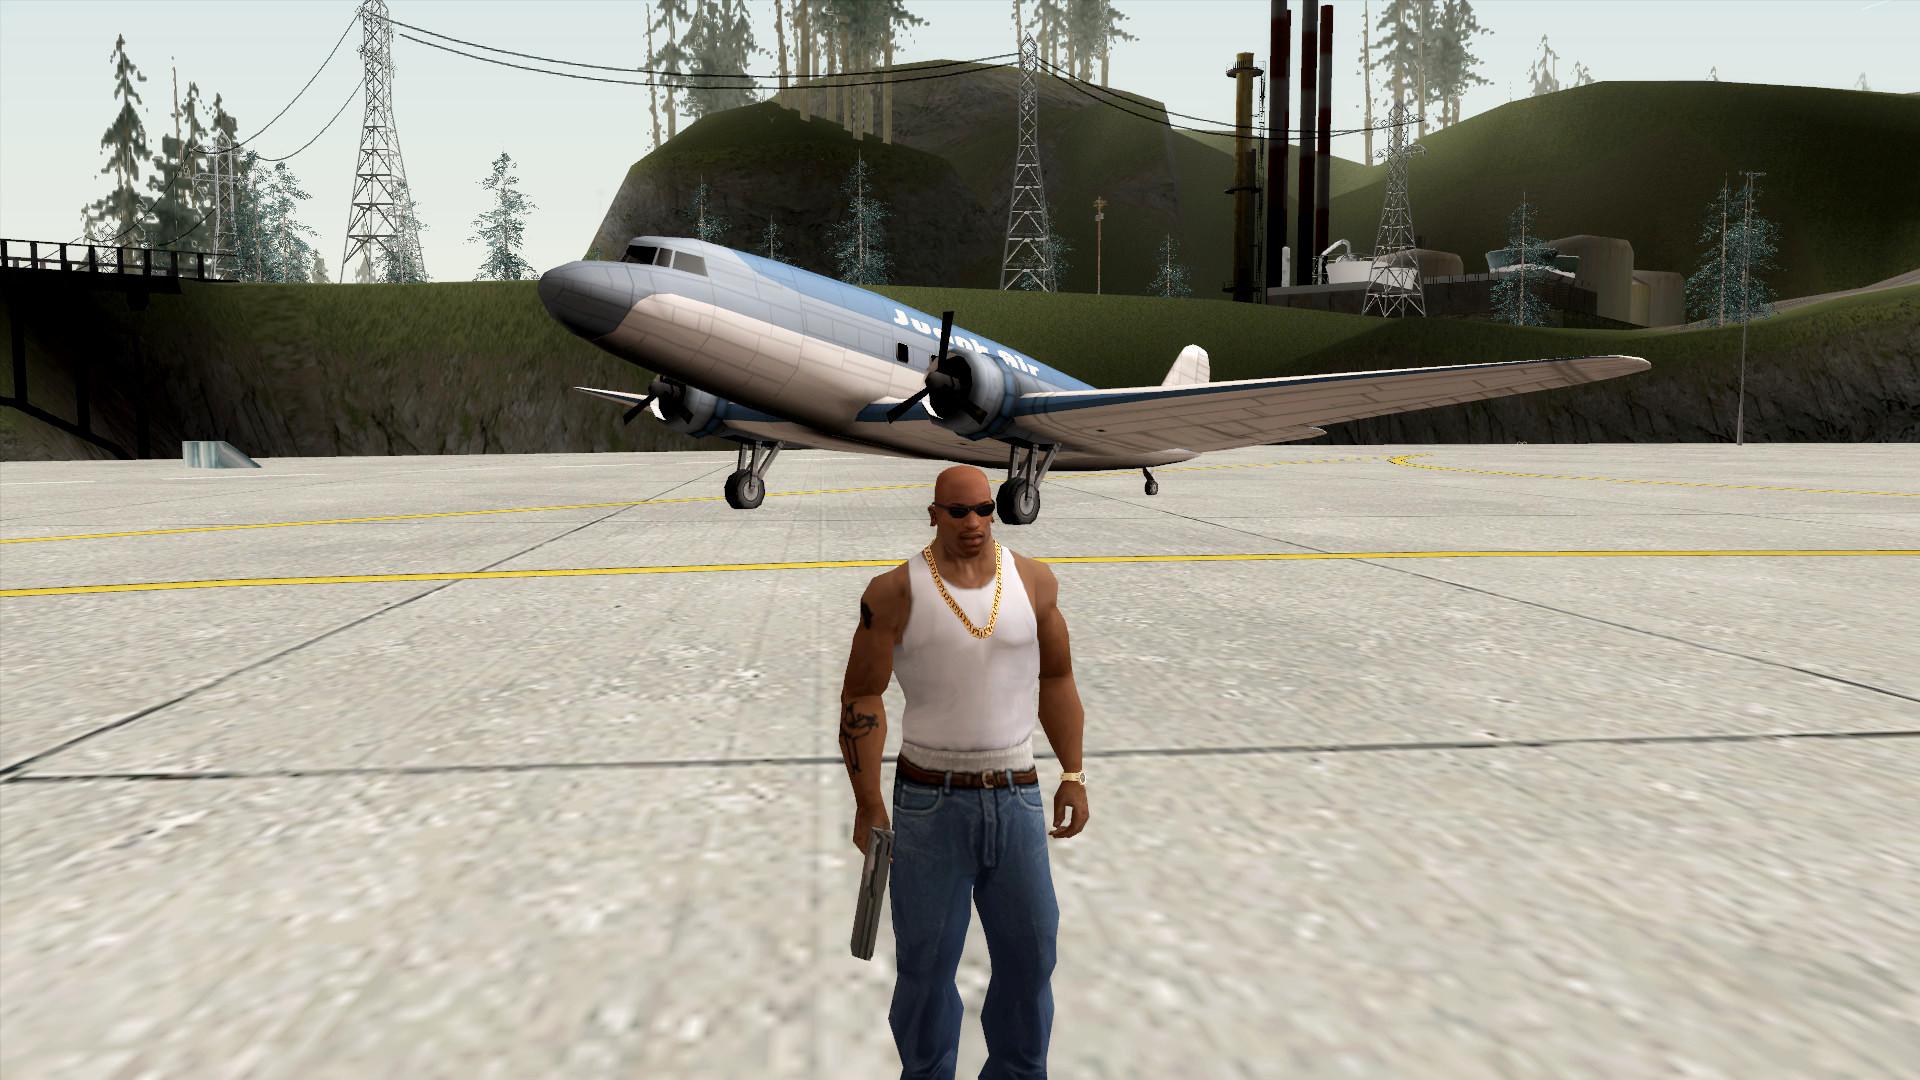 gta_sa 2016-05-11 20-31-07-55.jpg - Grand Theft Auto: San Andreas